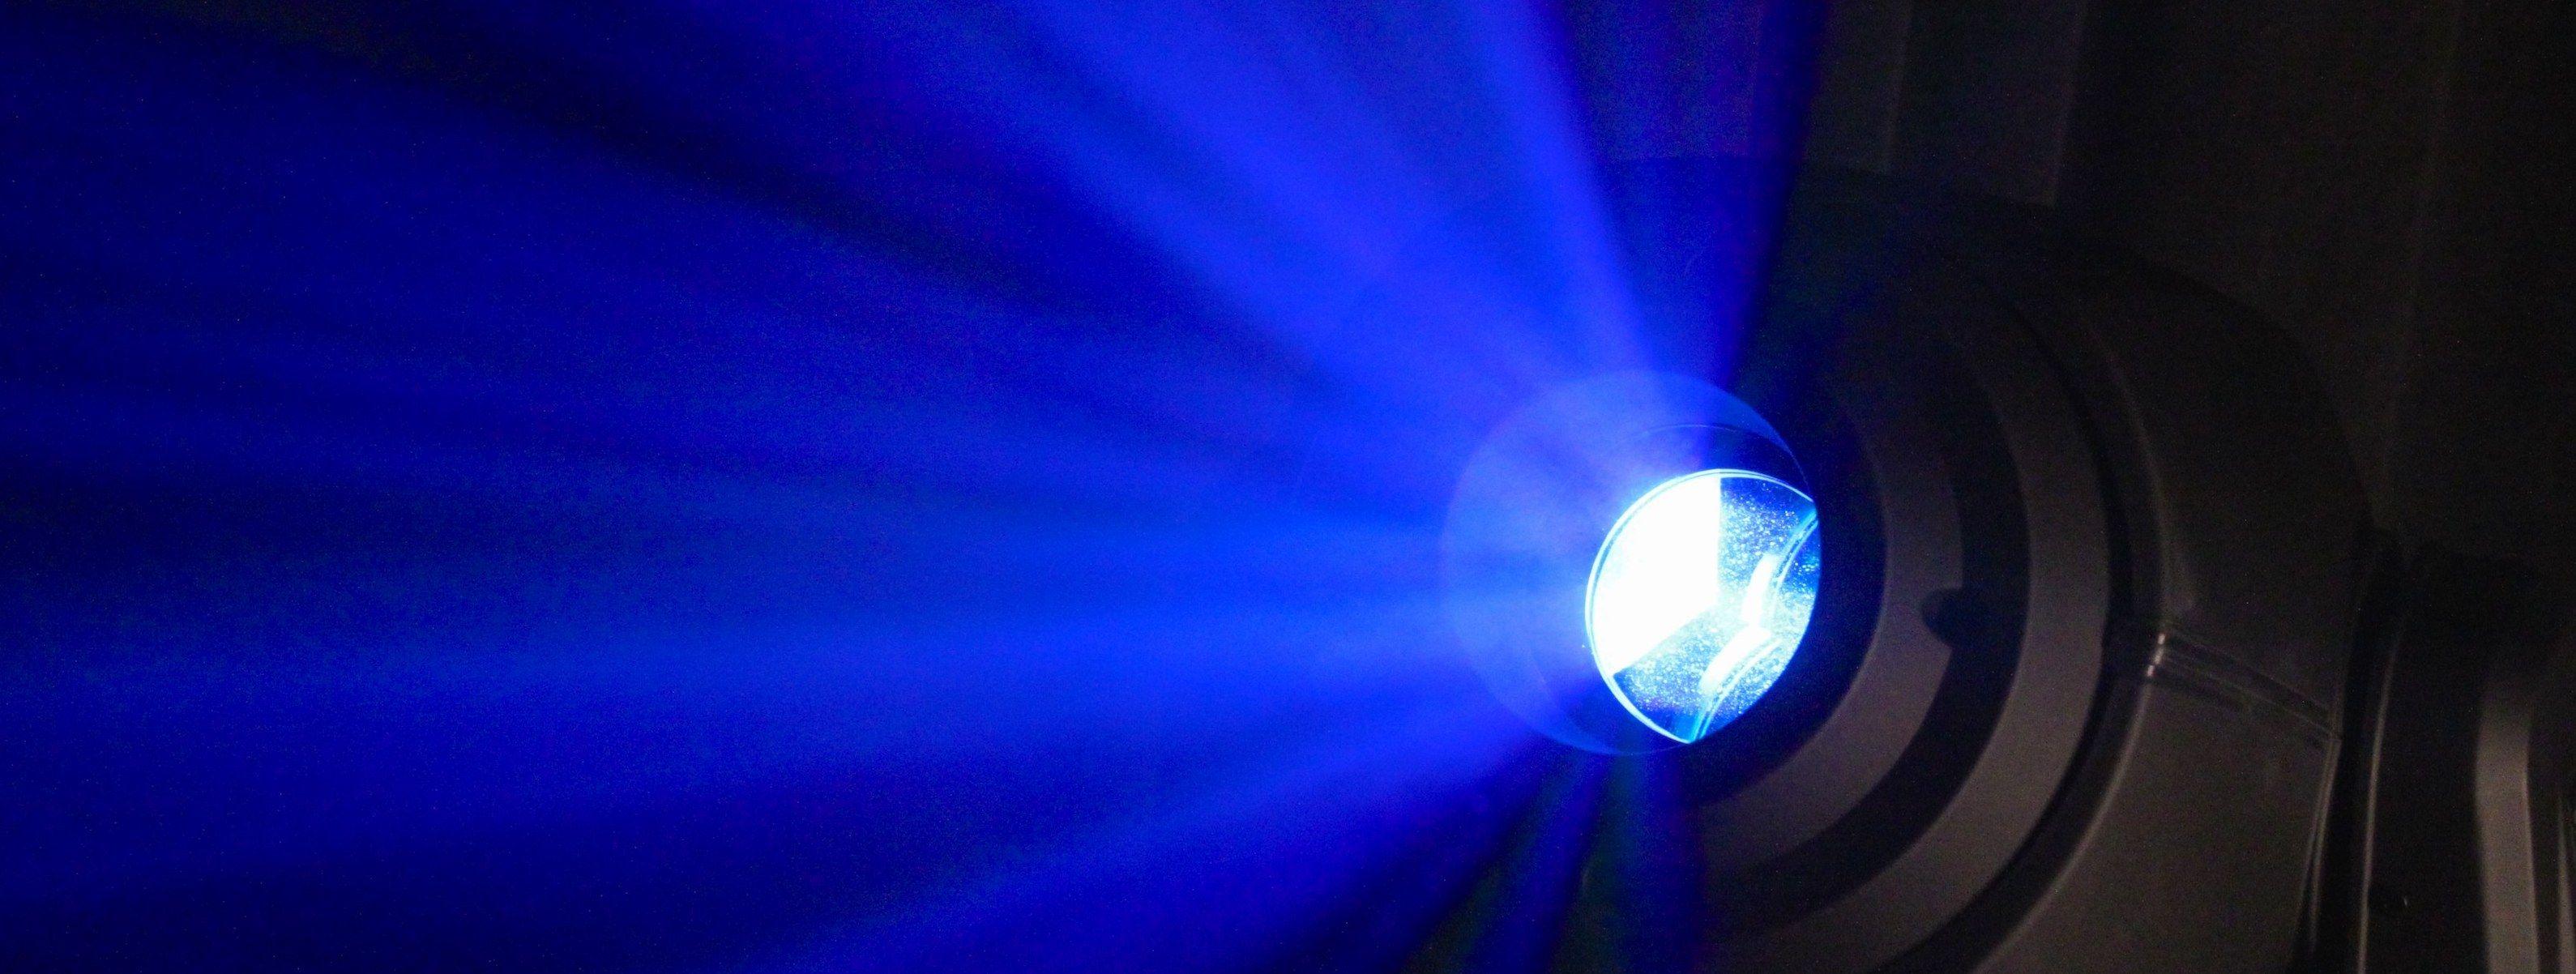 Close up of an LED light